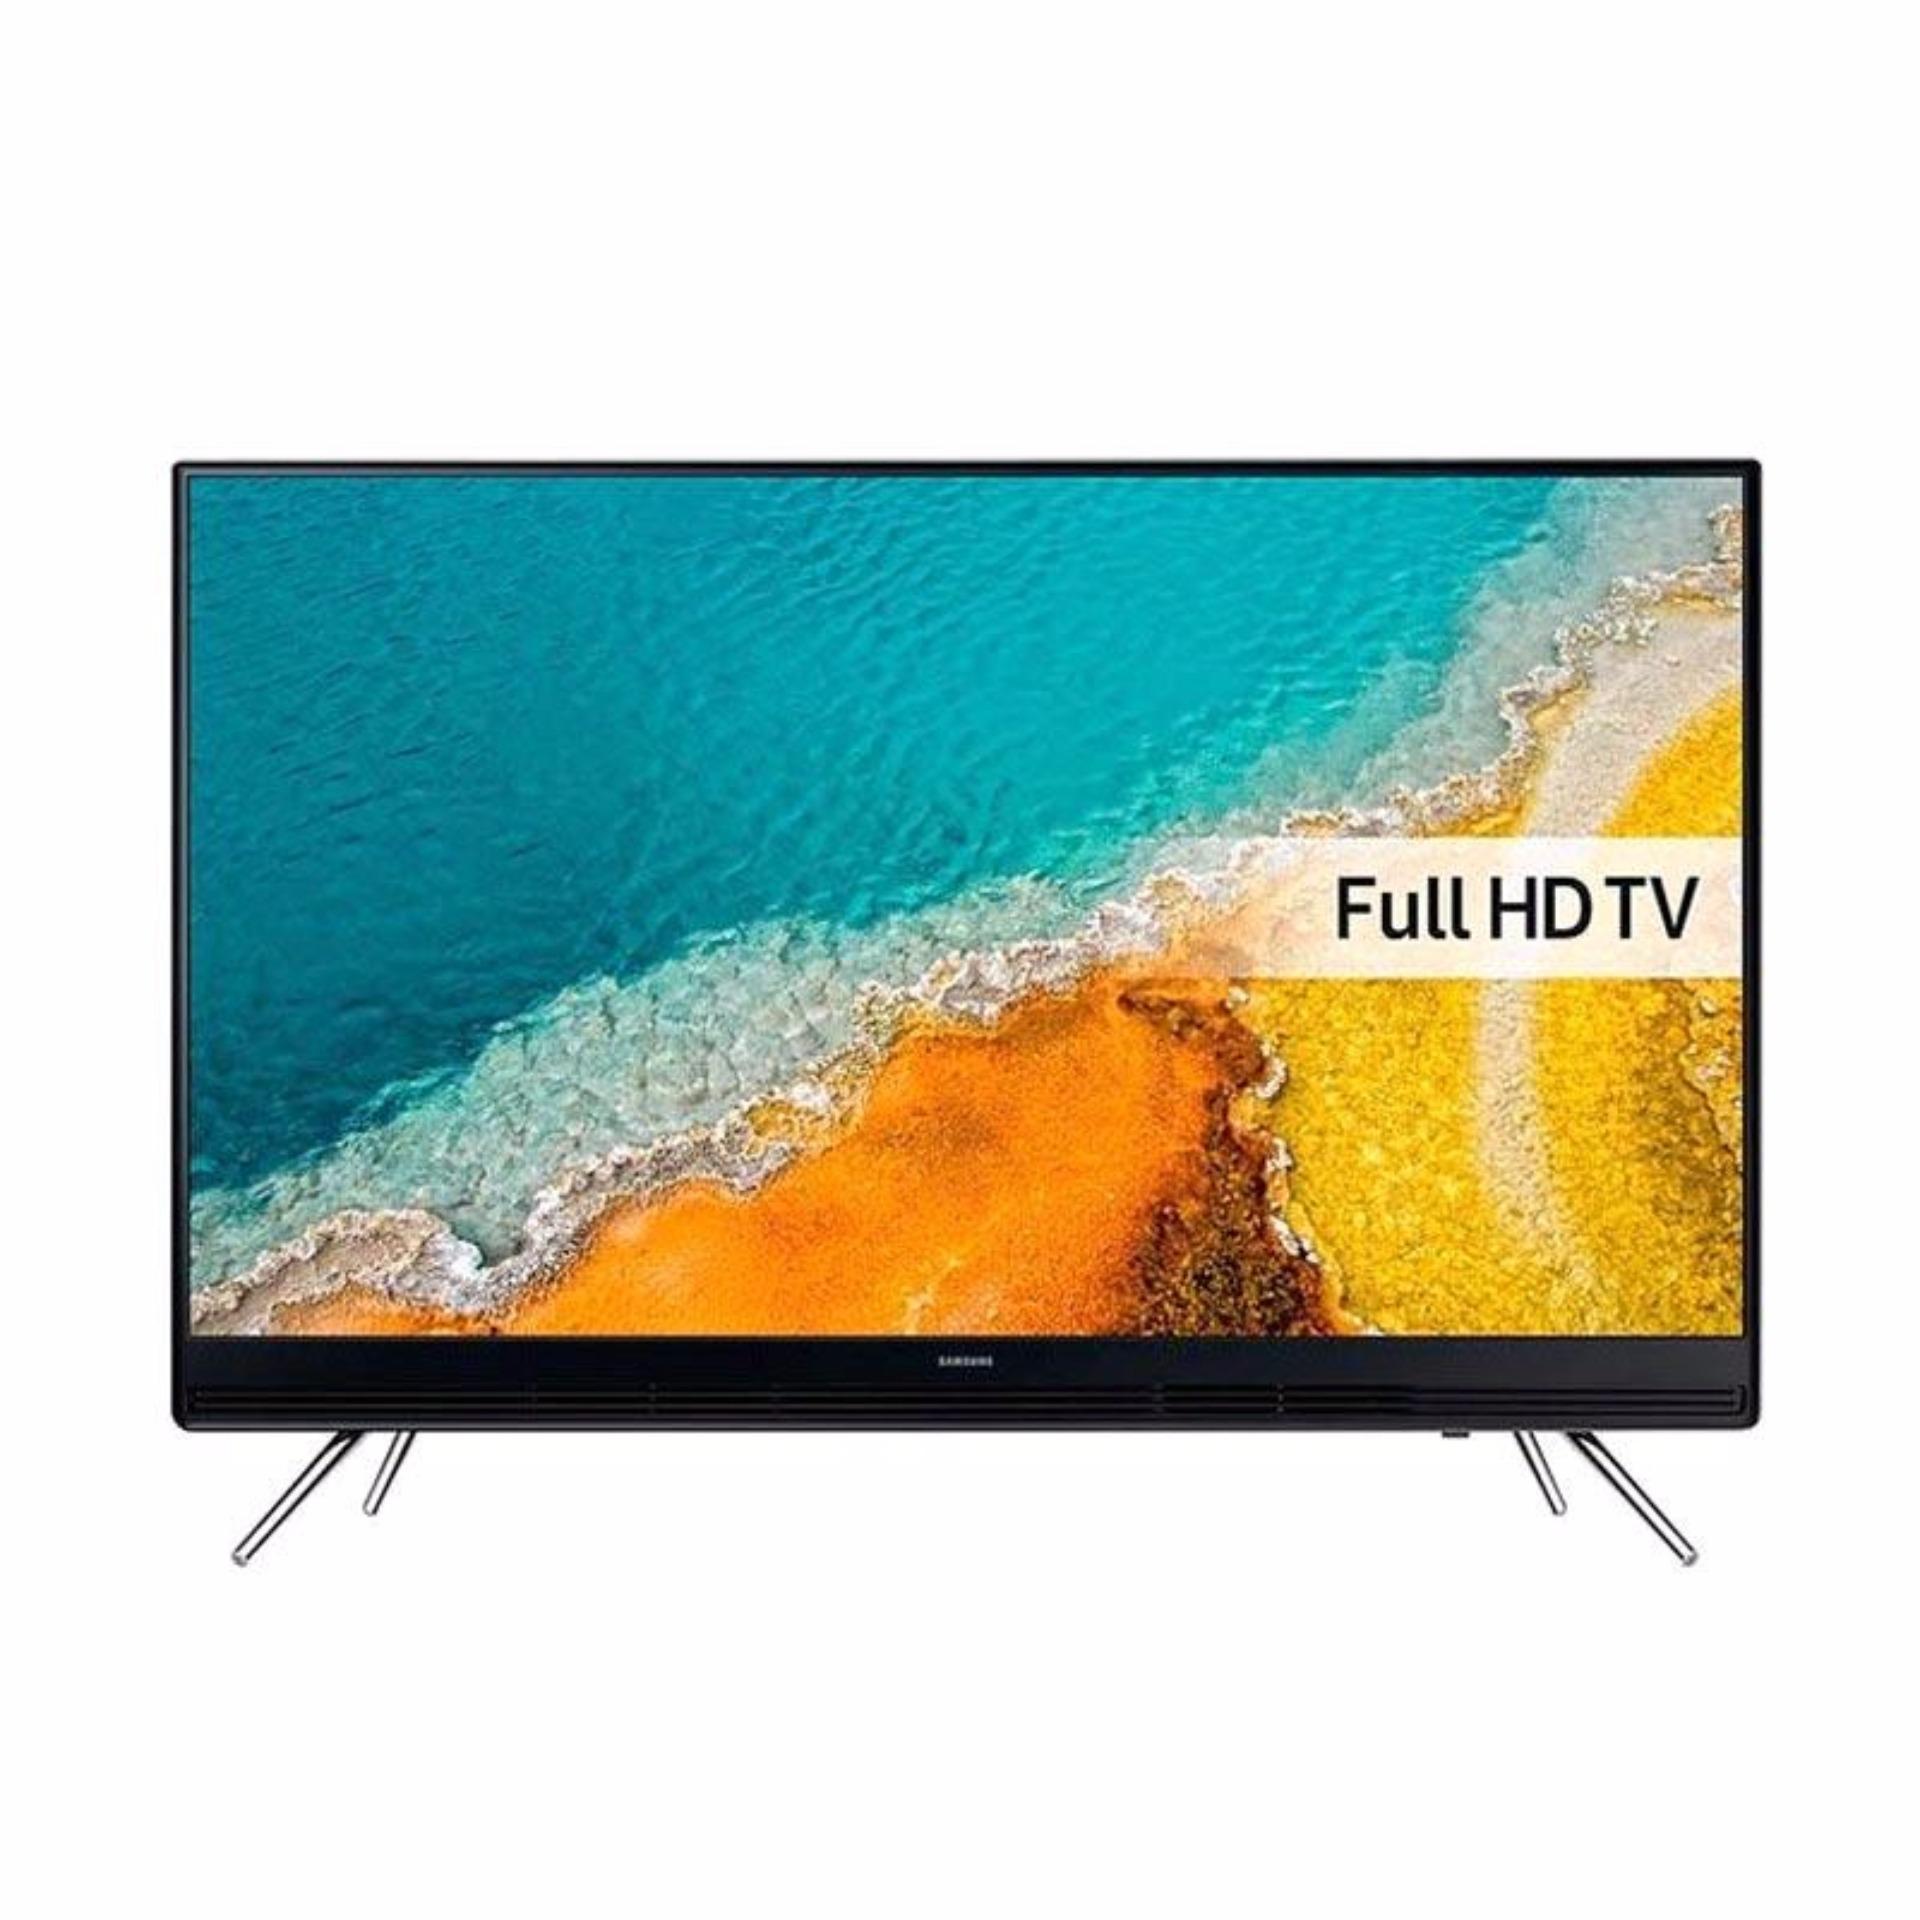 Samsung UA32K5100 K5100 Series 5 LED TV [32 Inch/Full HD]